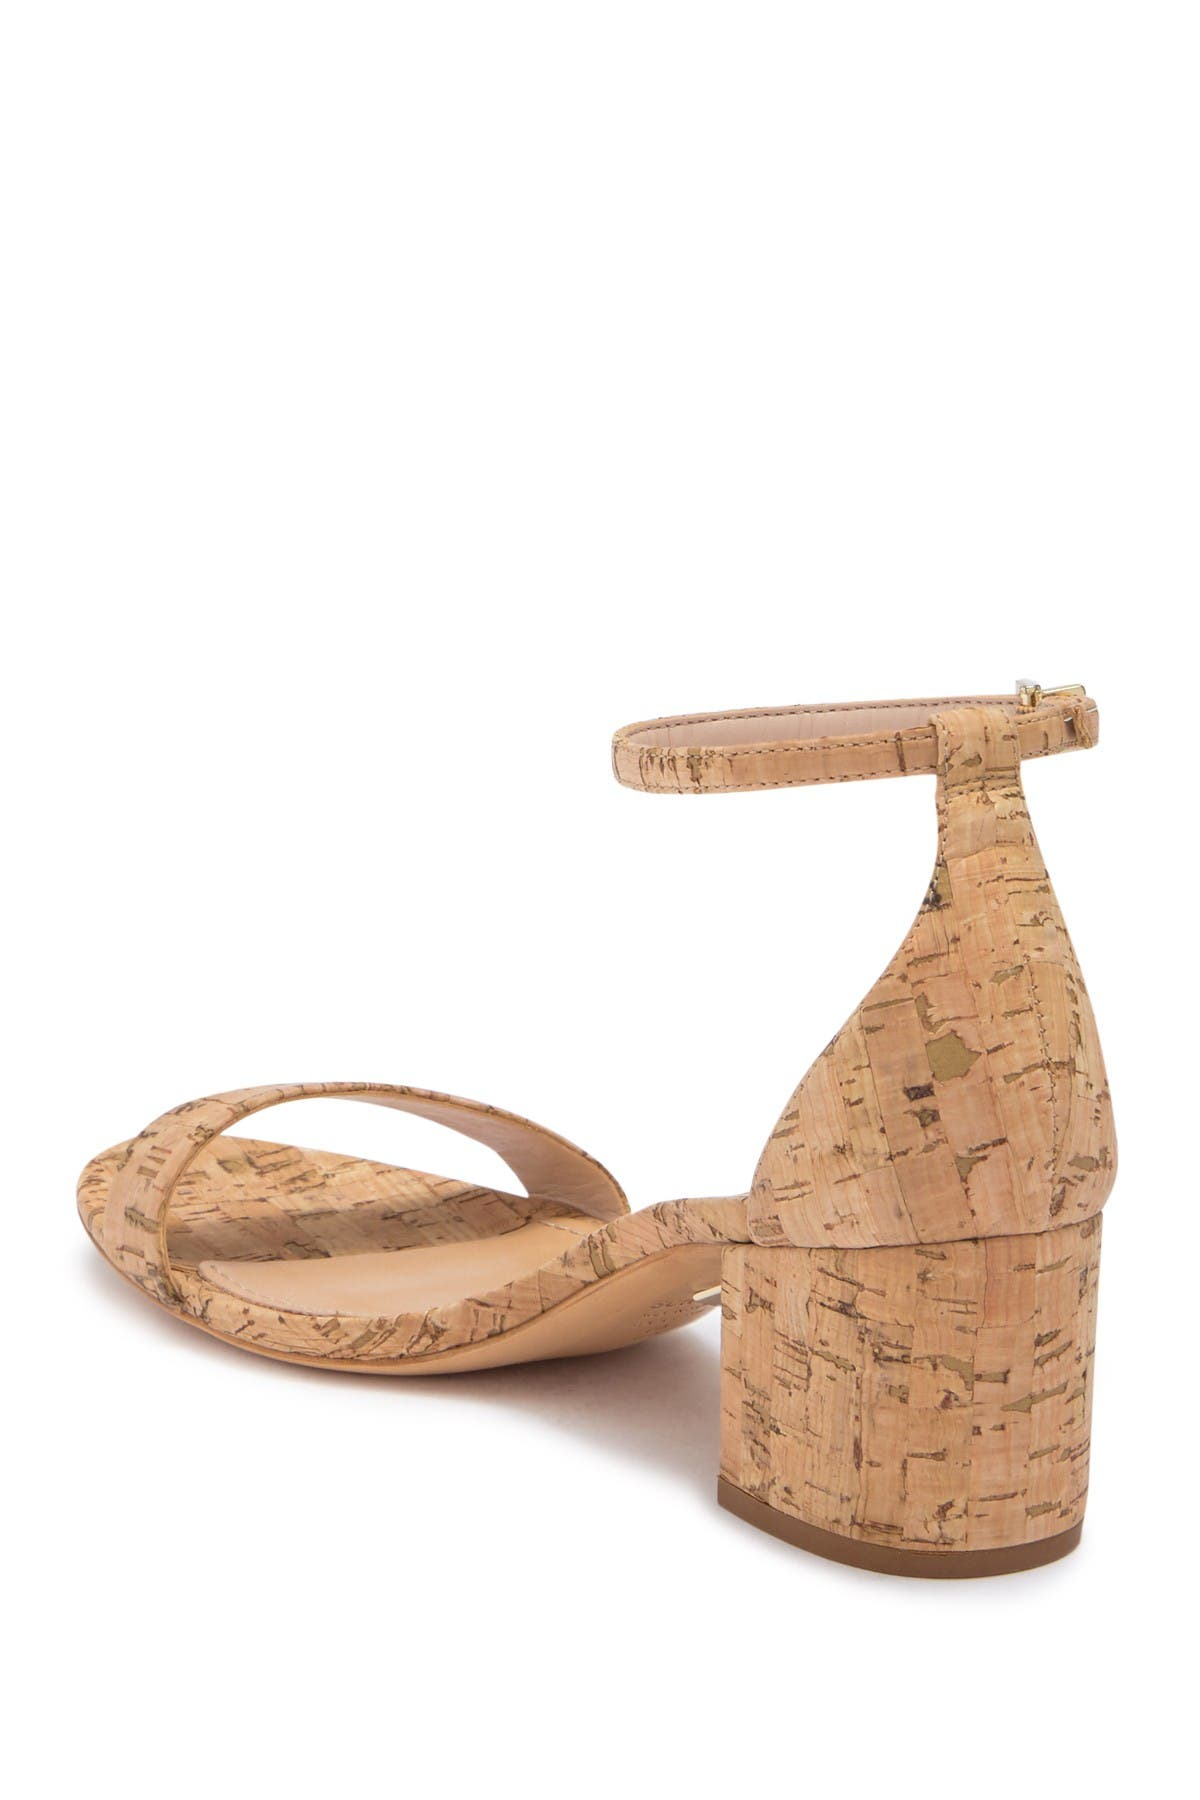 Image of Schutz Chimes Cork Block Heel Sandal